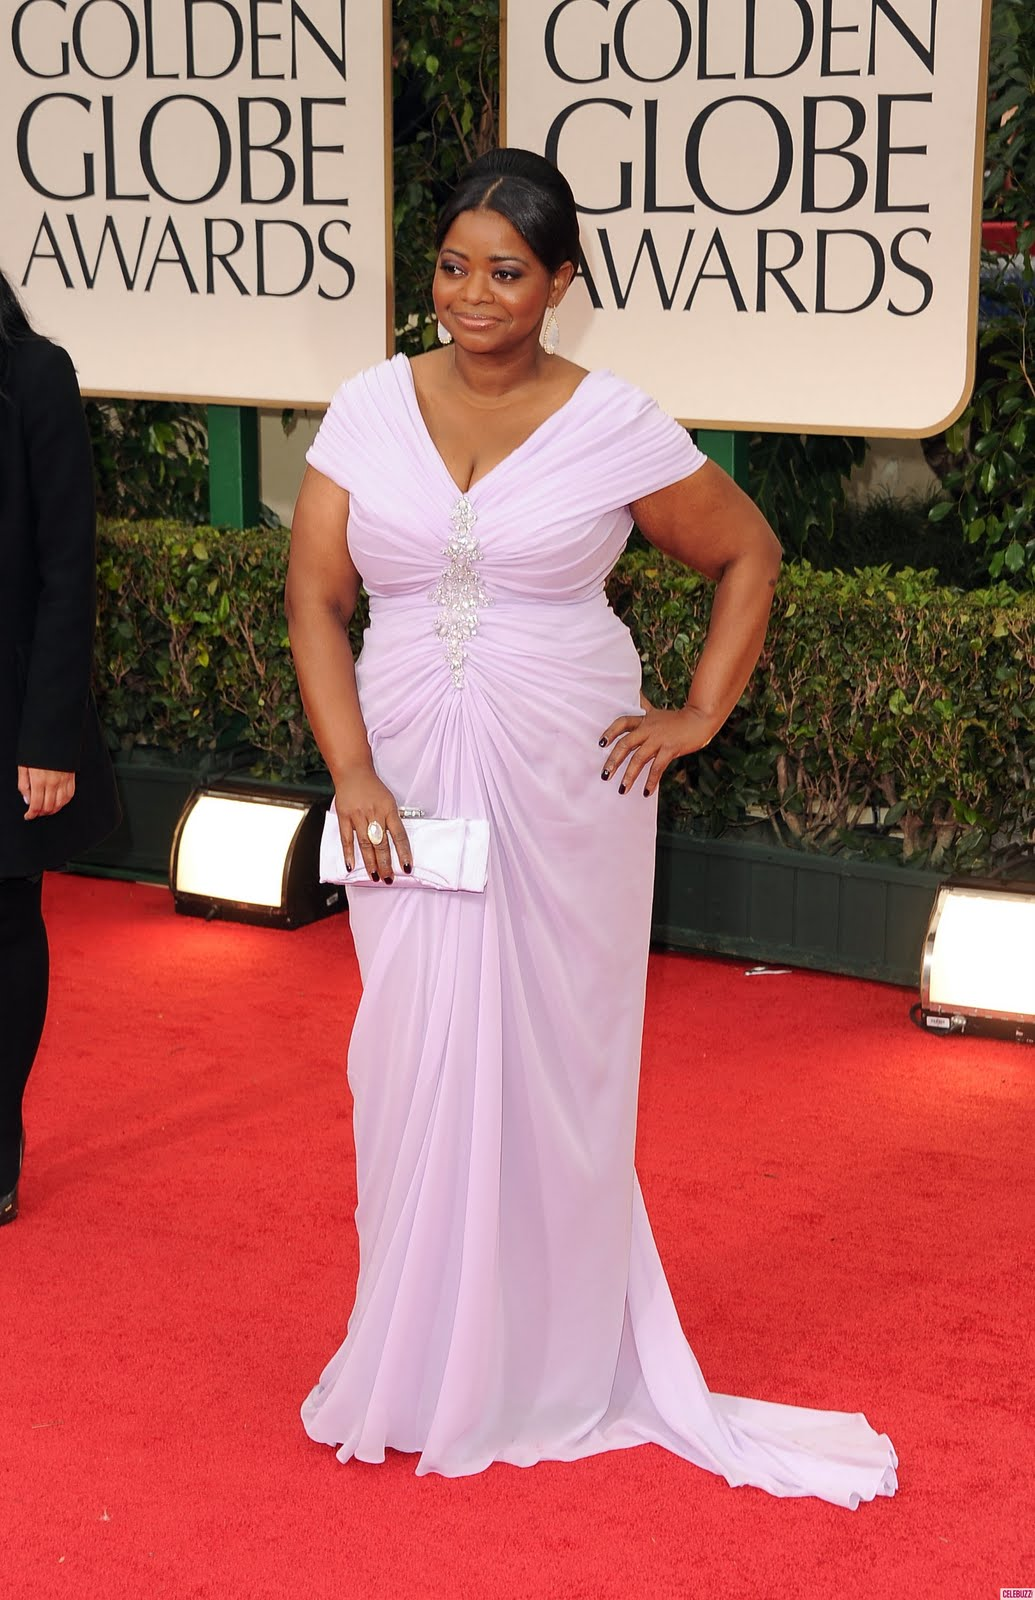 http://3.bp.blogspot.com/-Tg0poK1Ikis/TxRqilf6erI/AAAAAAAAHxs/mqsIRtYTIXs/s1600/Golden-Globes-2012-Best-Dressed-4-1941x3000.jpg